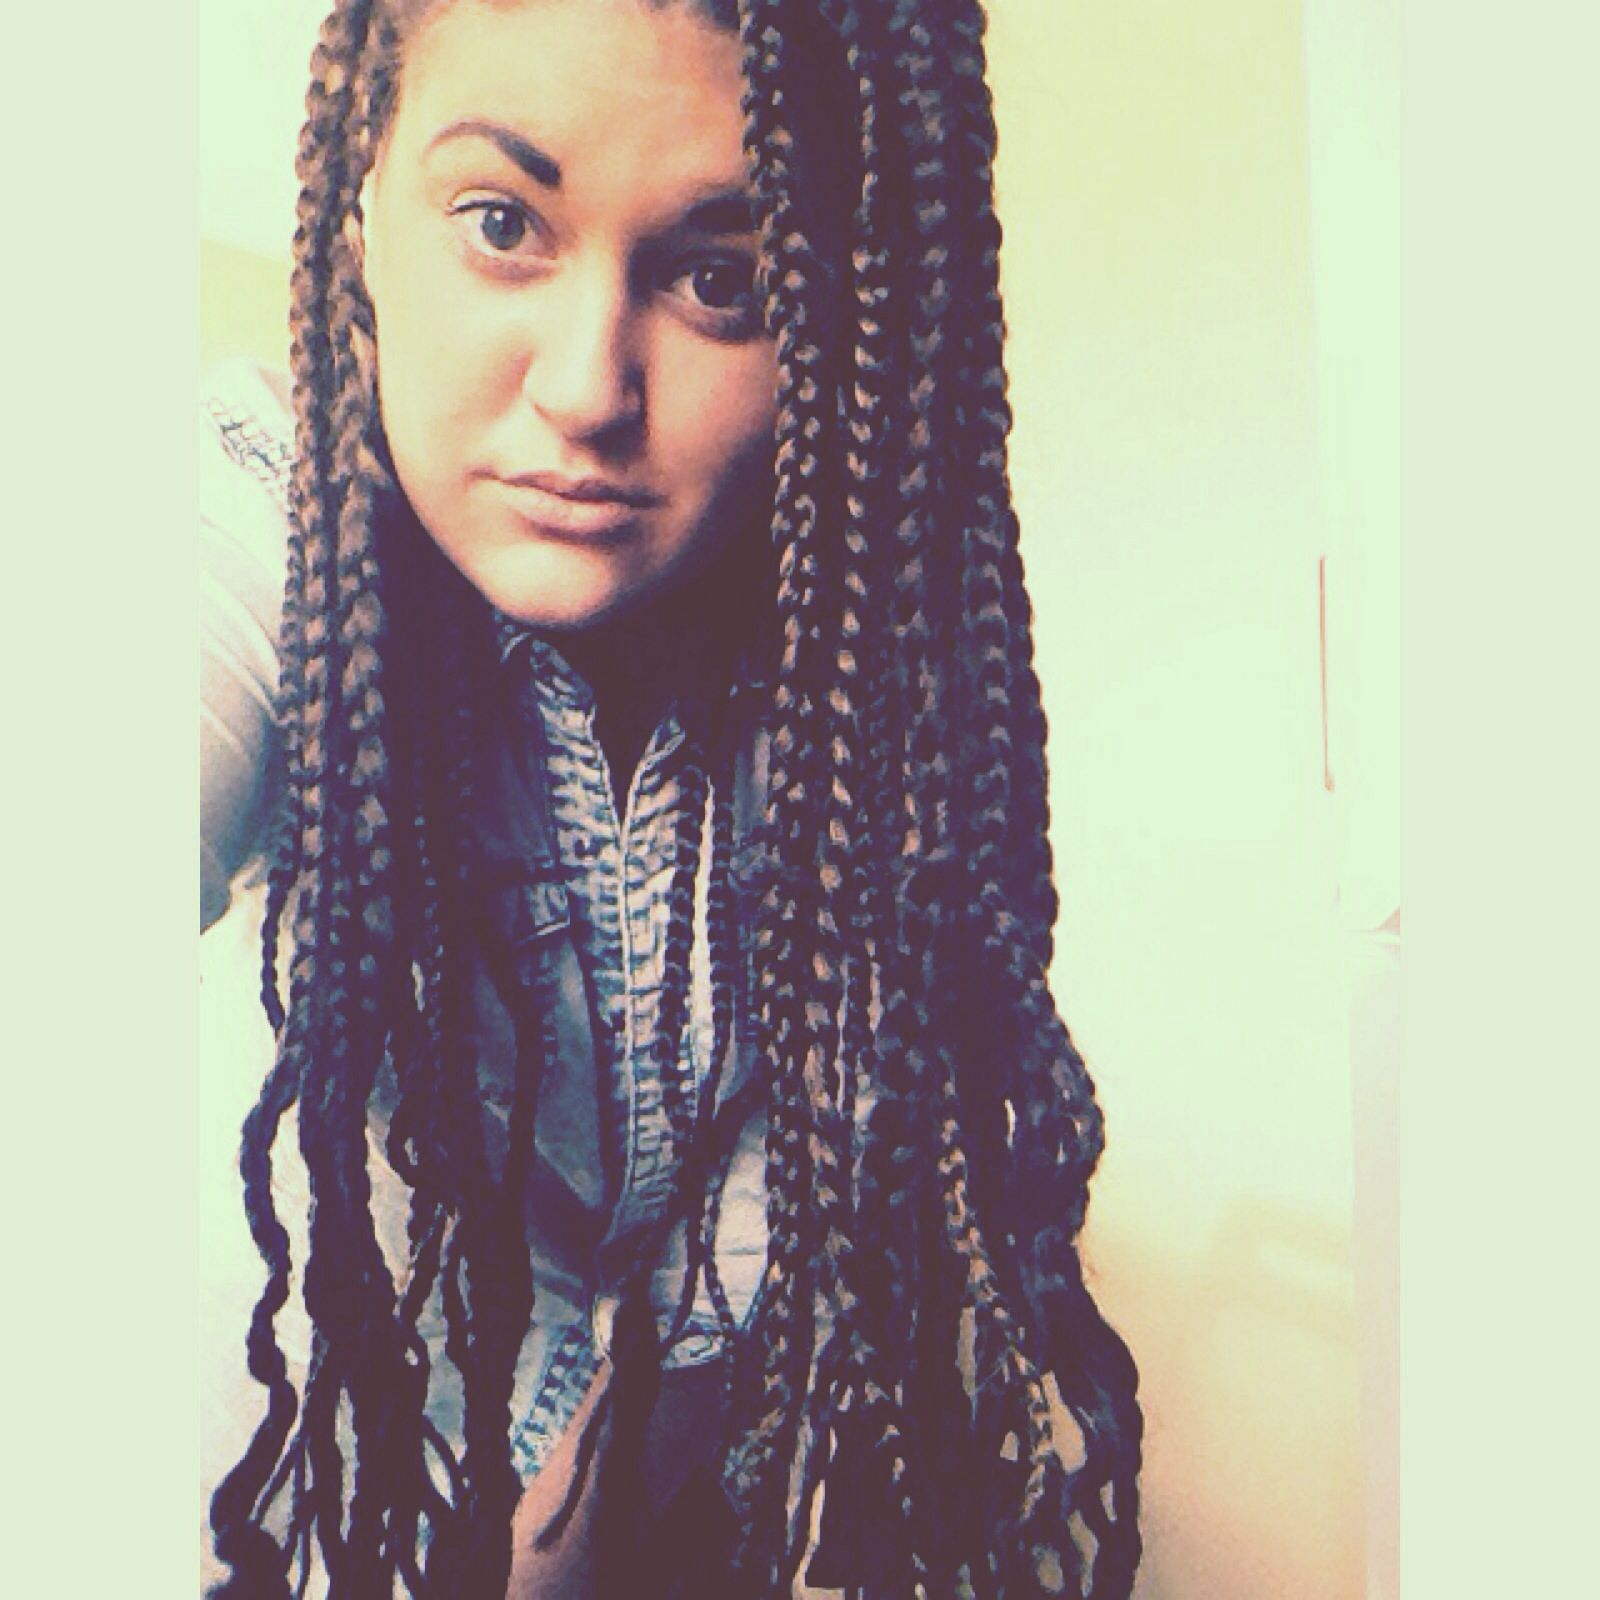 White girl with box braids | Hair/nails/makeup | Pinterest ...